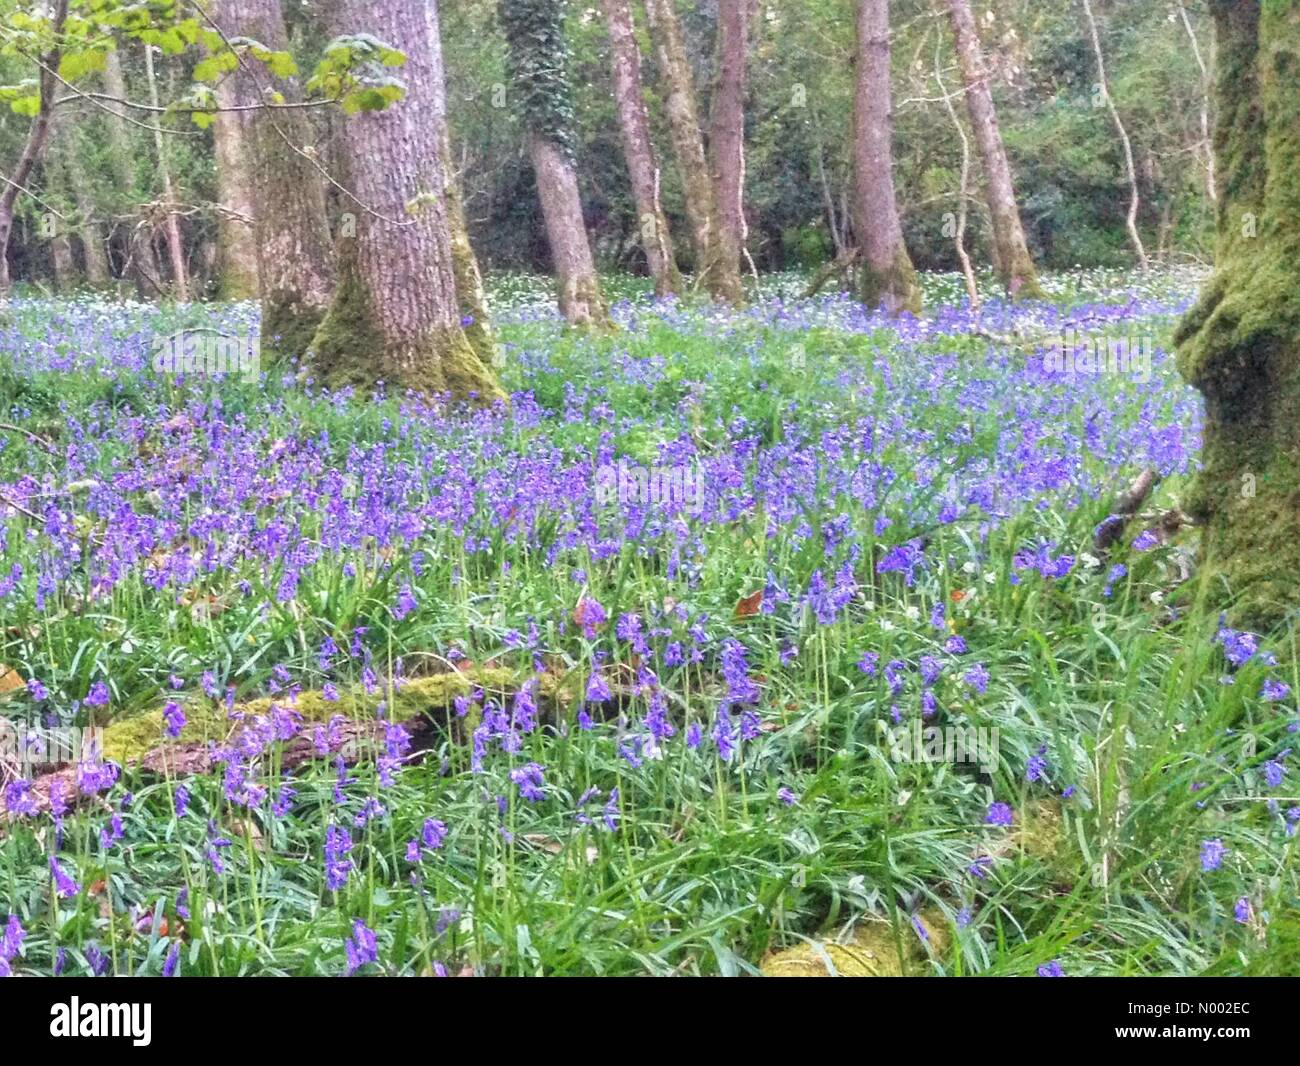 Doddiscombsleigh, Devon, UK. 25th Apr, 2015. Carpet of bluebells and wild garlic in Doddiscombsleigh, Devon Credit: - Stock Image